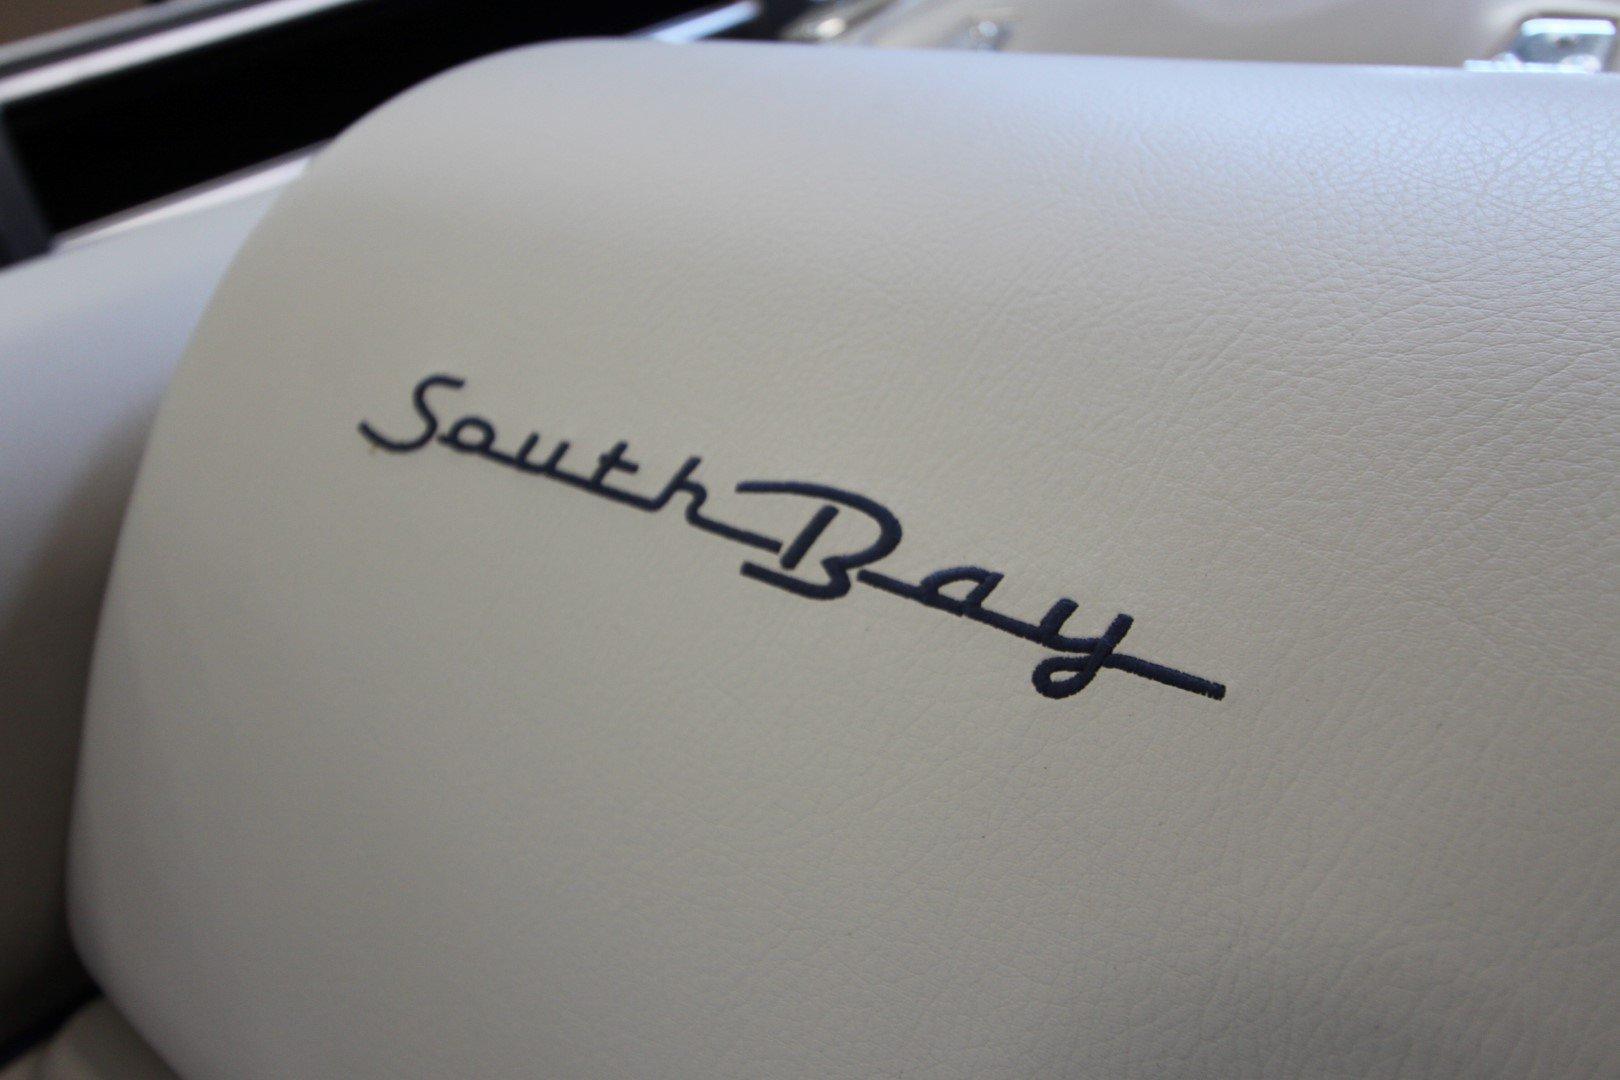 South Bay 525 E - IMG_6367